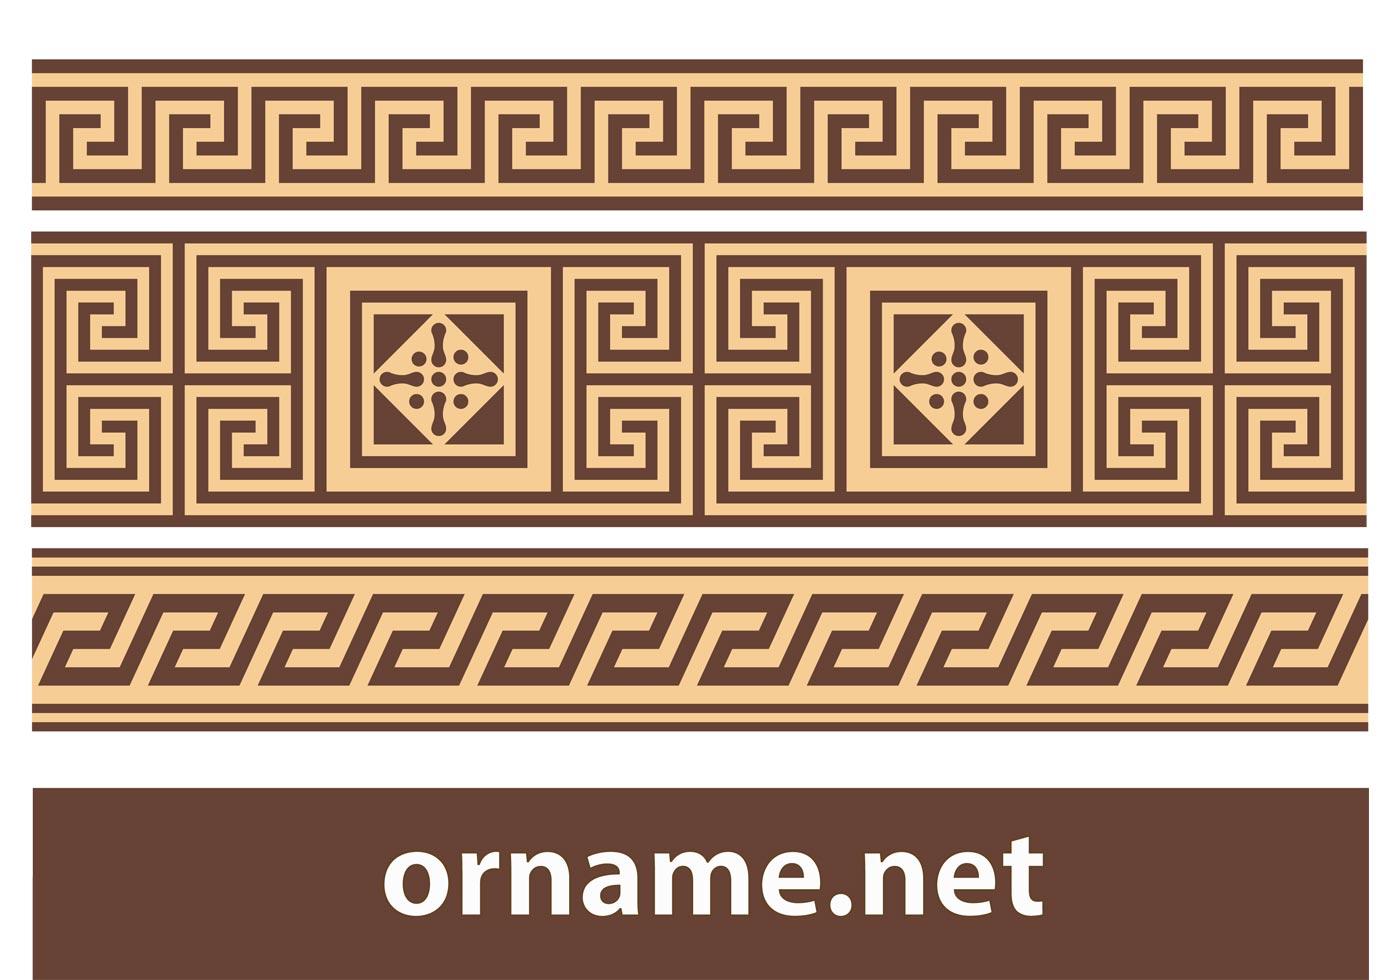 1400x980 Free Greek Vector Ornament Free Vector Art From Vecteezy!